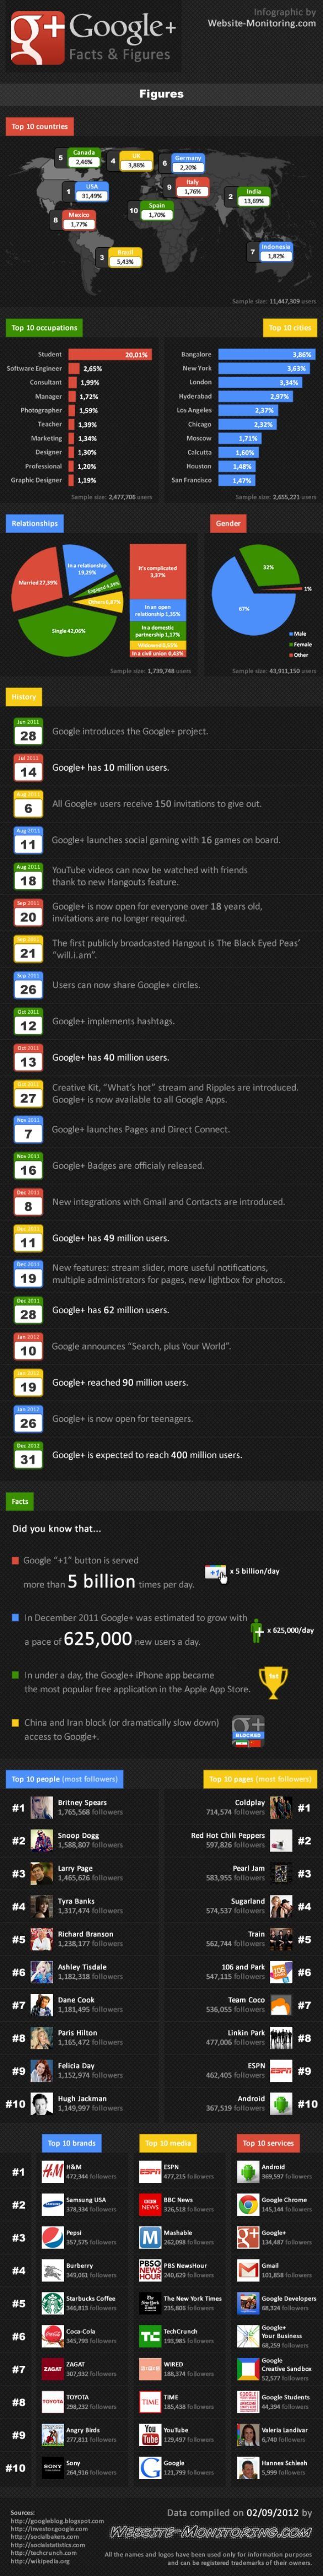 G+ Zahlen 2012